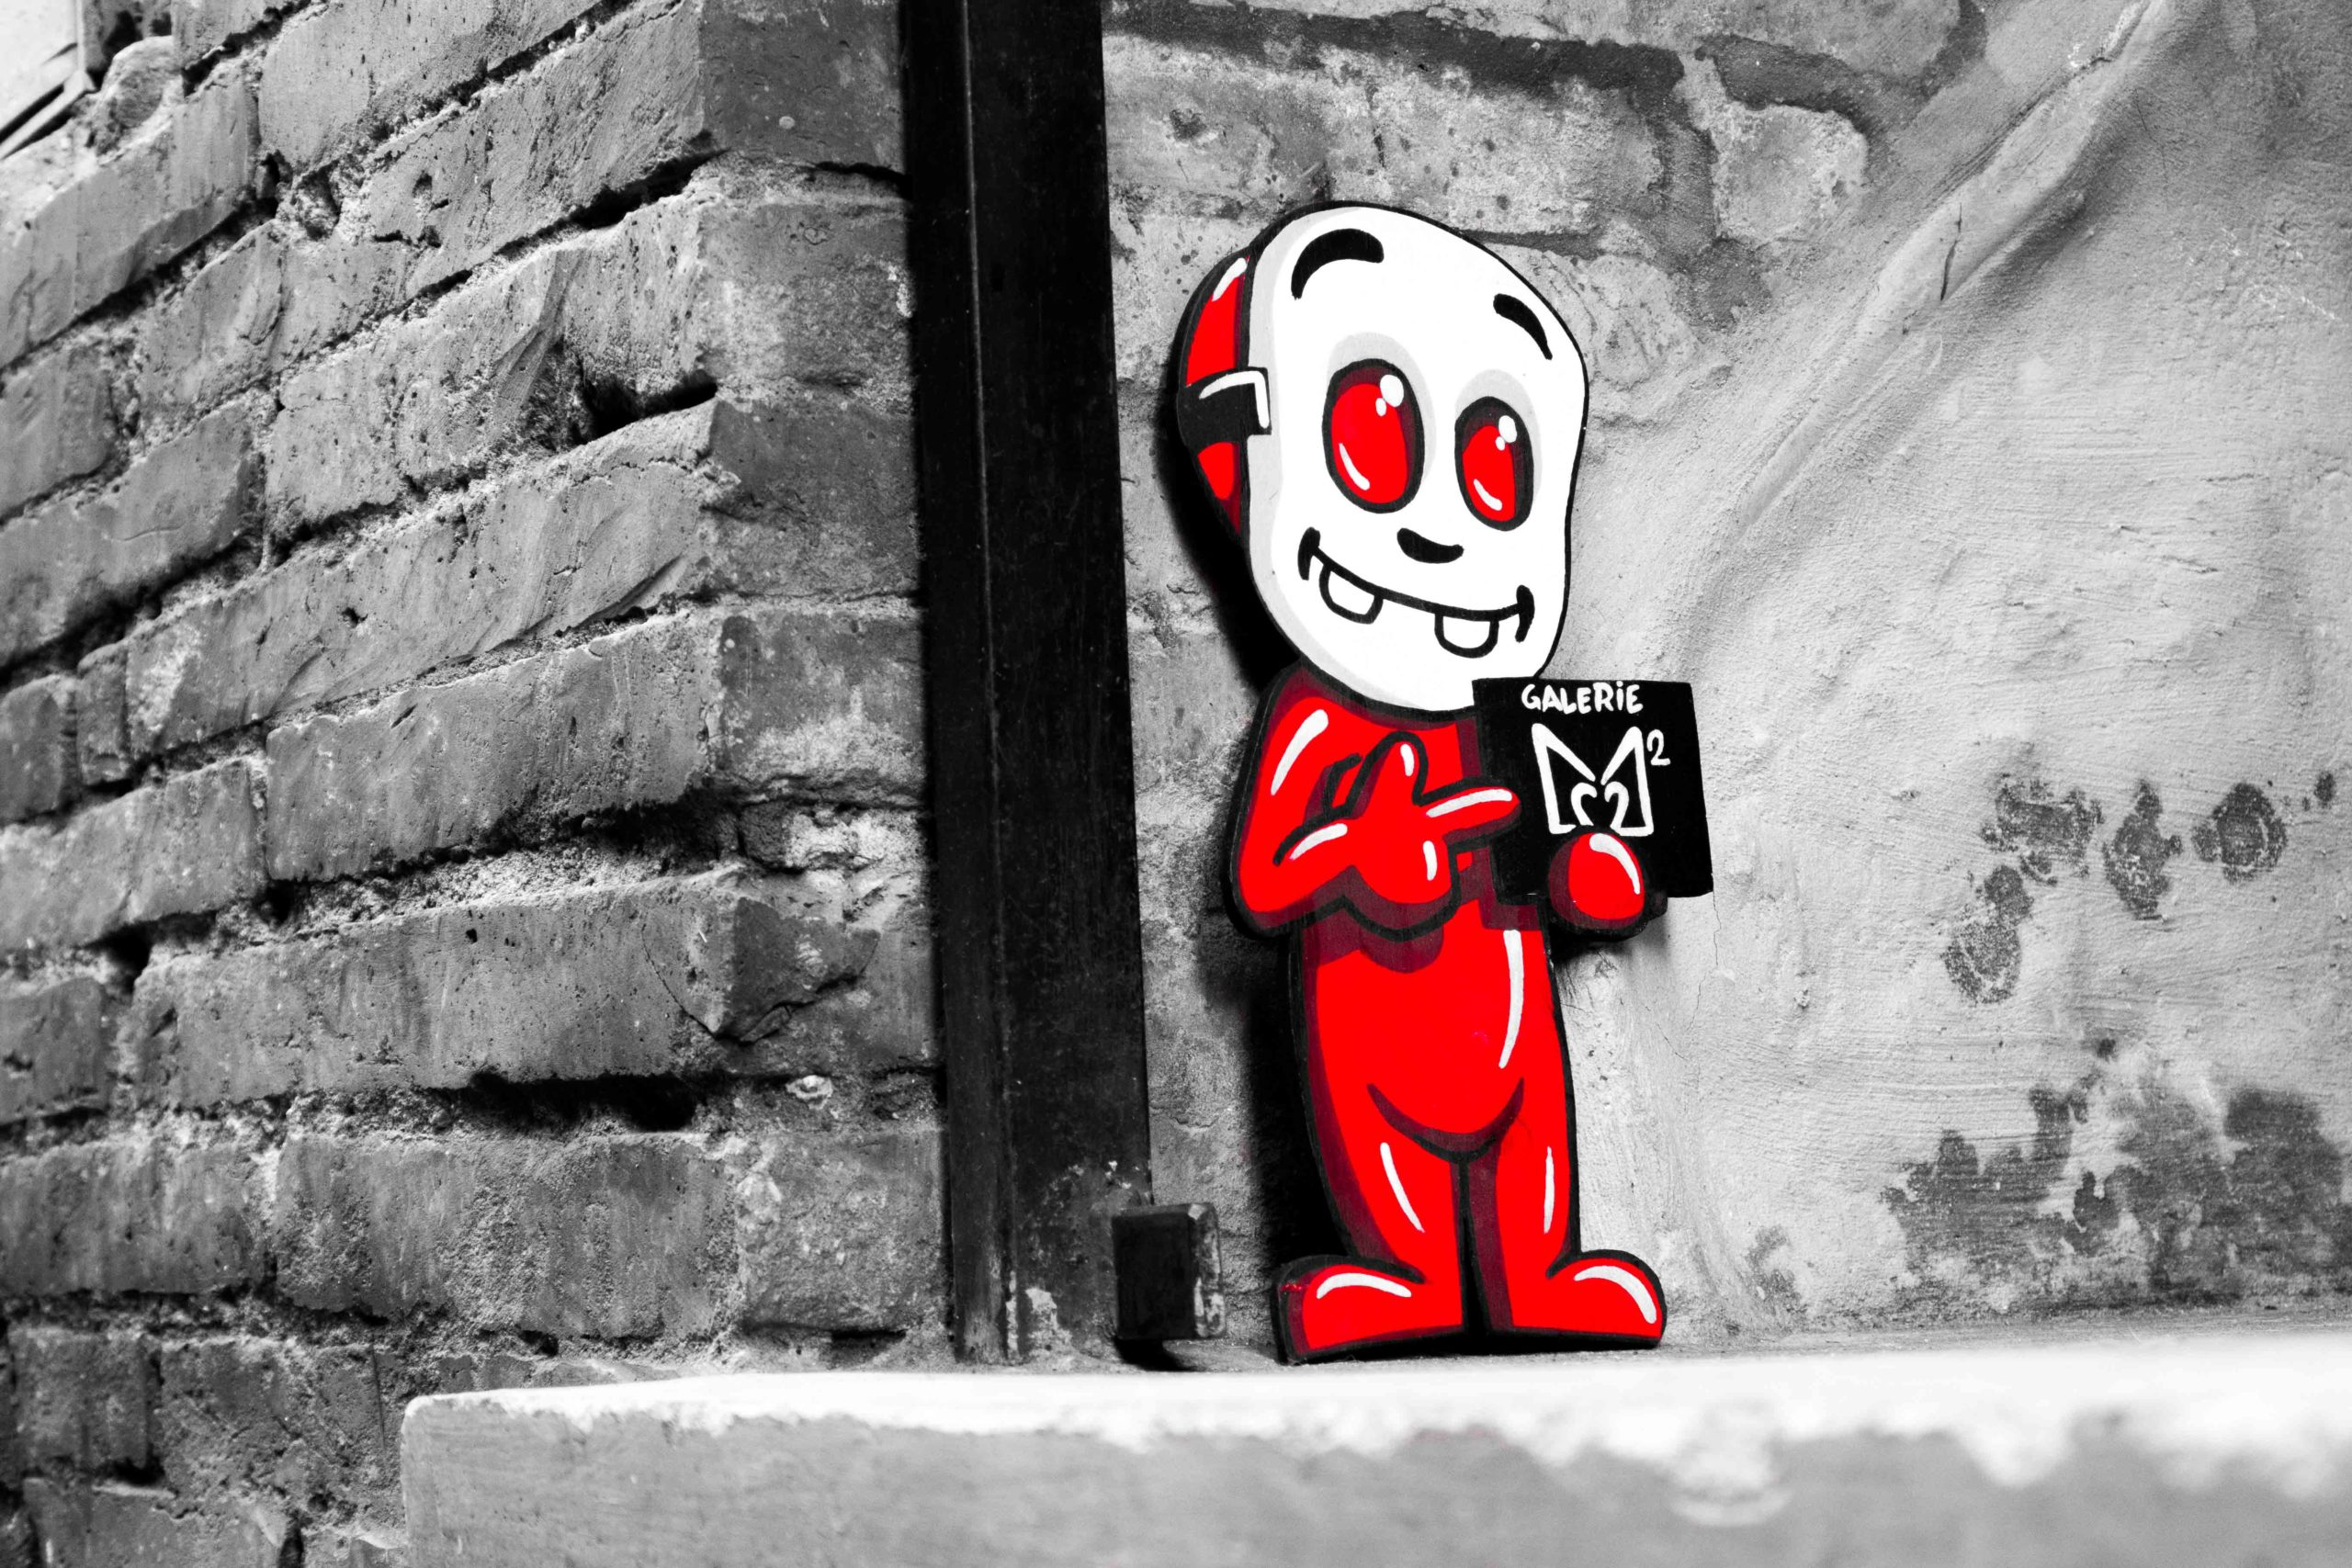 e57e street art 22m2 toulouse